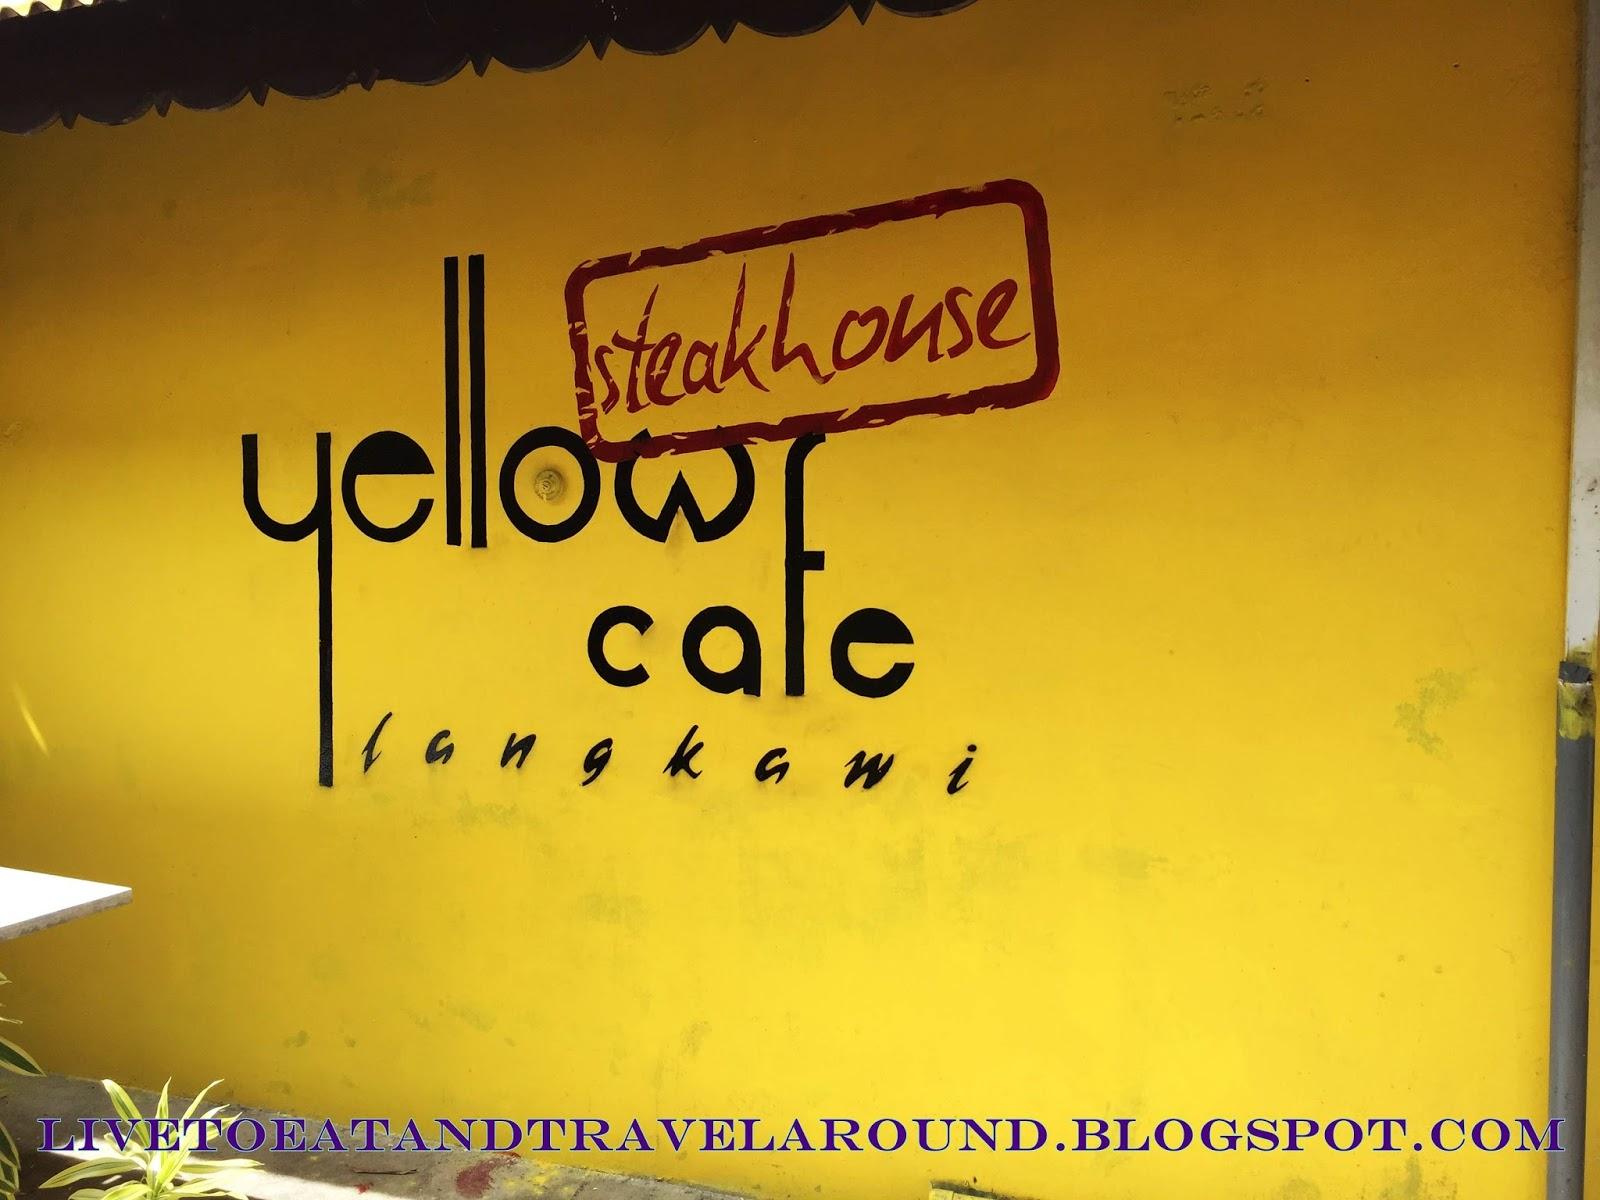 langkawi yellow cafe pantai cenang the villa zf restaurant - Yellow Restaurant 2015